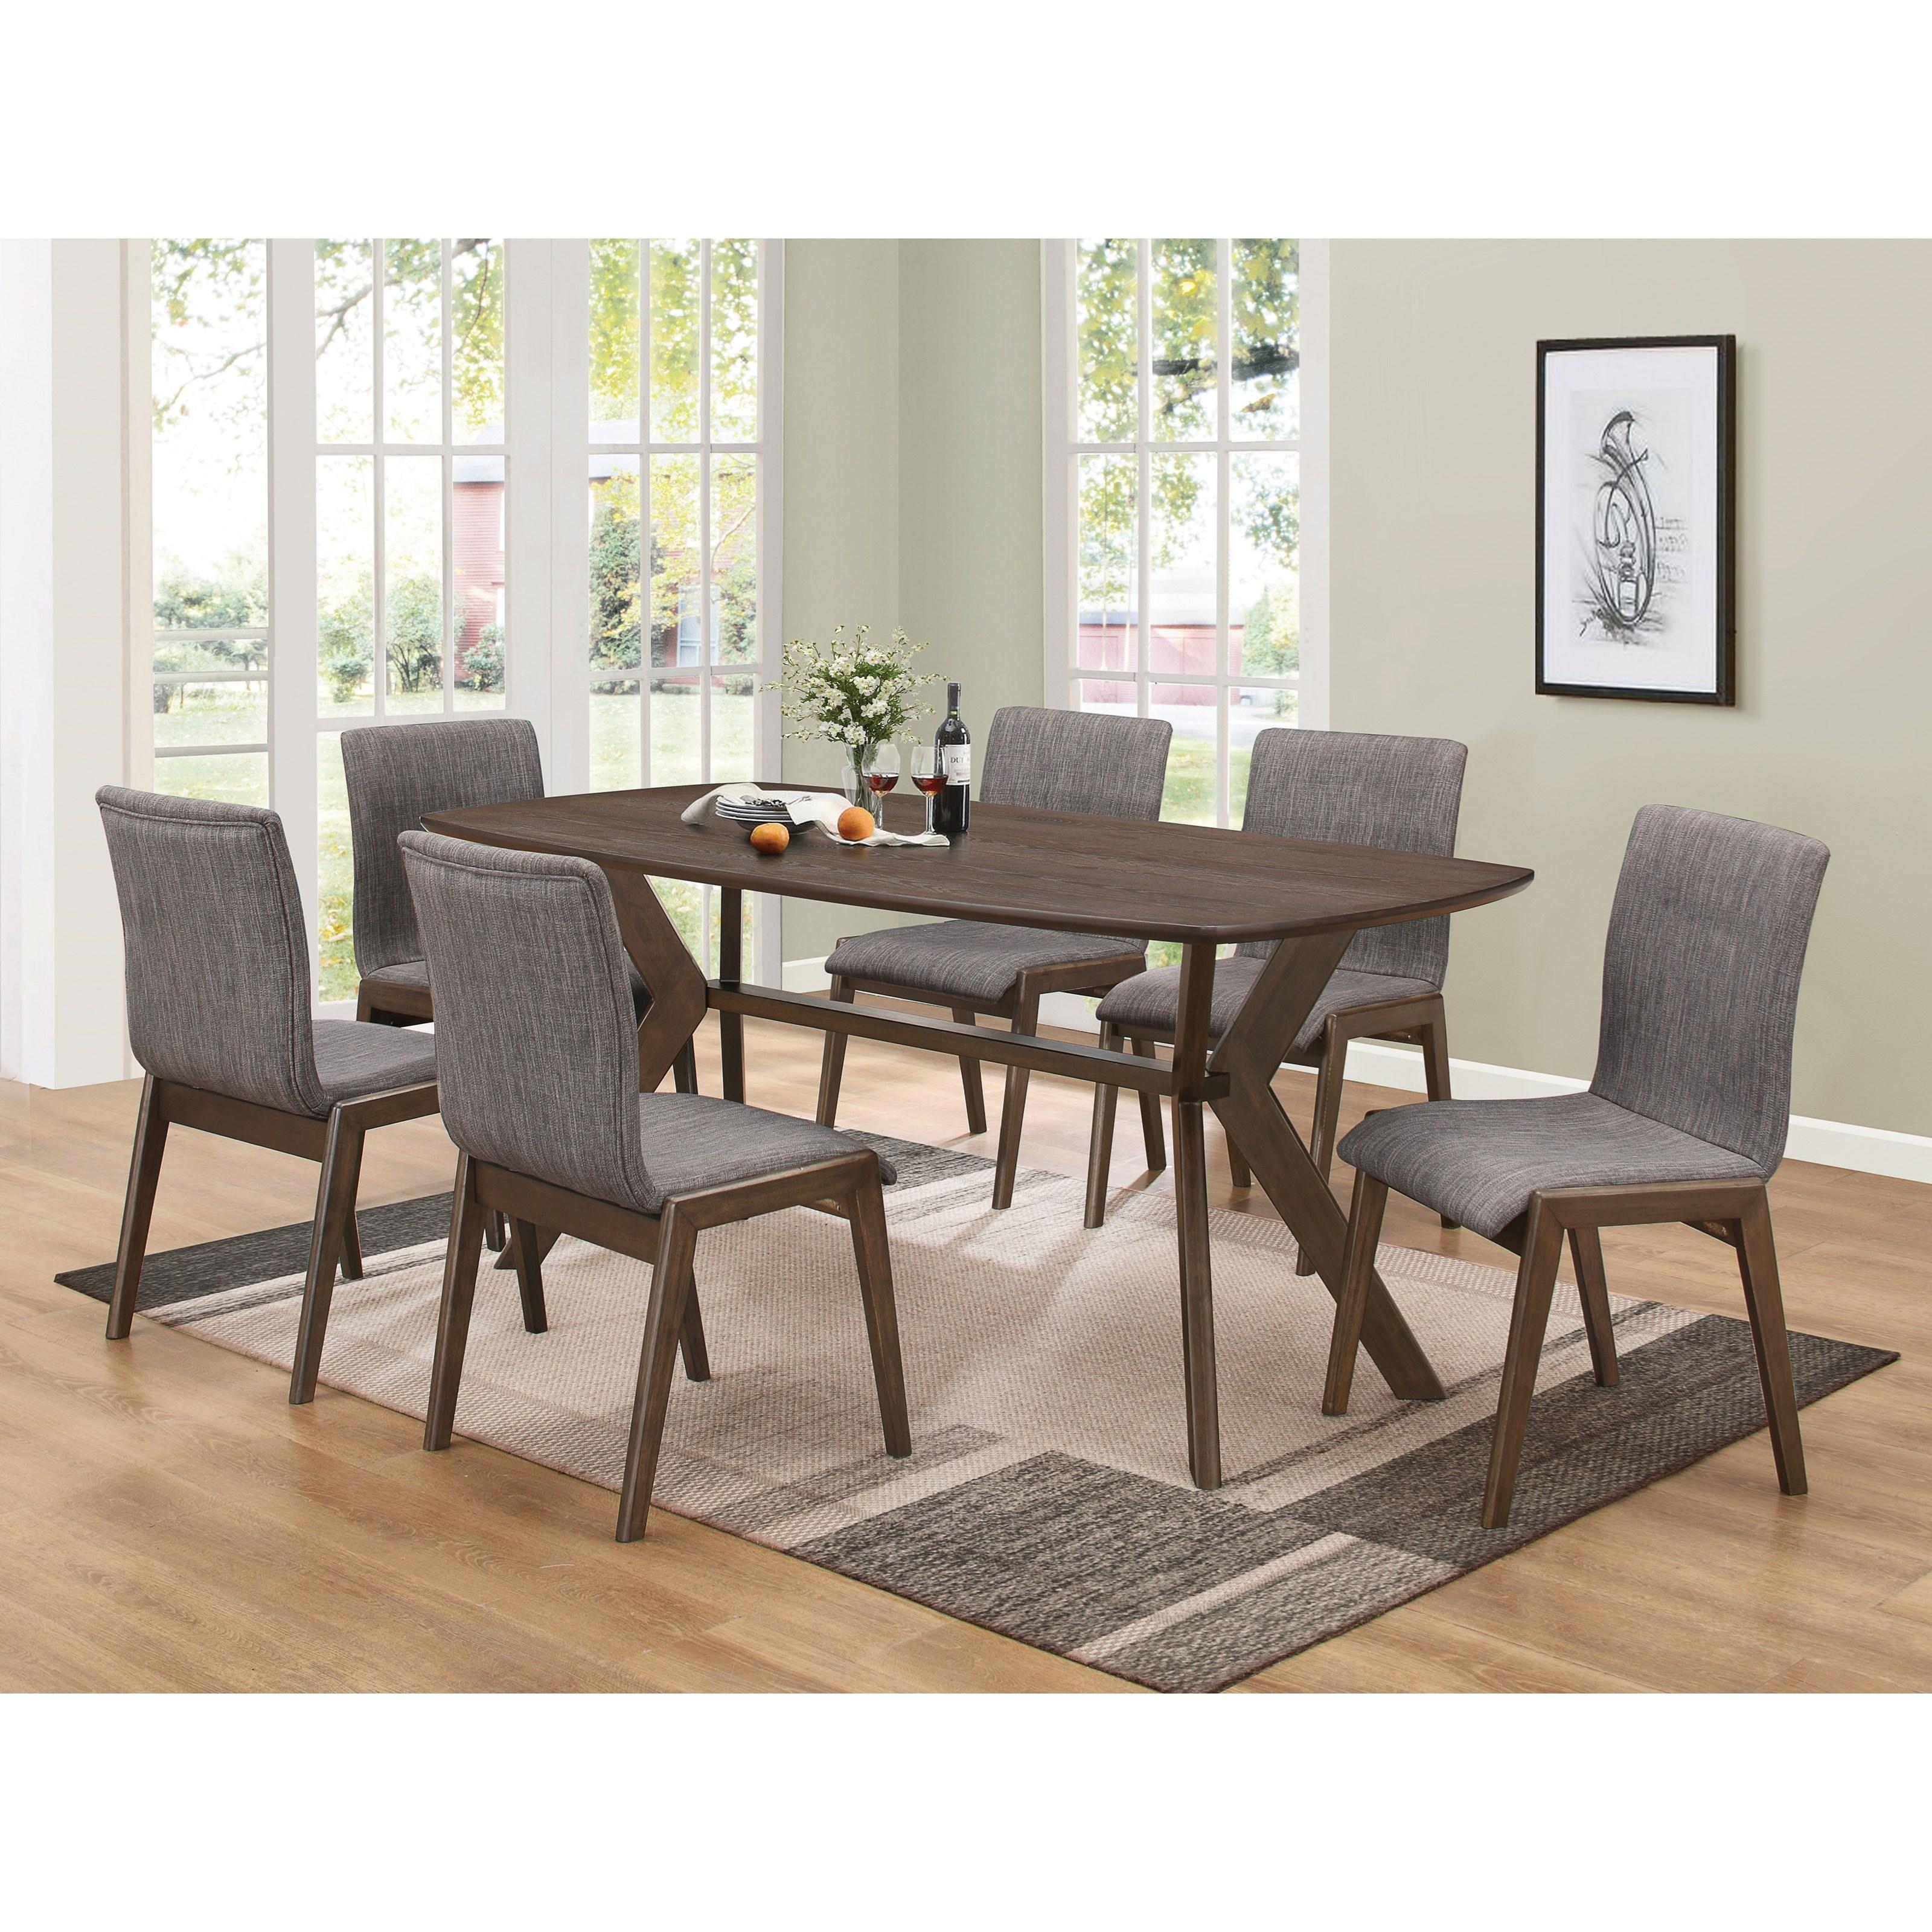 Coaster Mcbride Retro Dining Room Table Value City